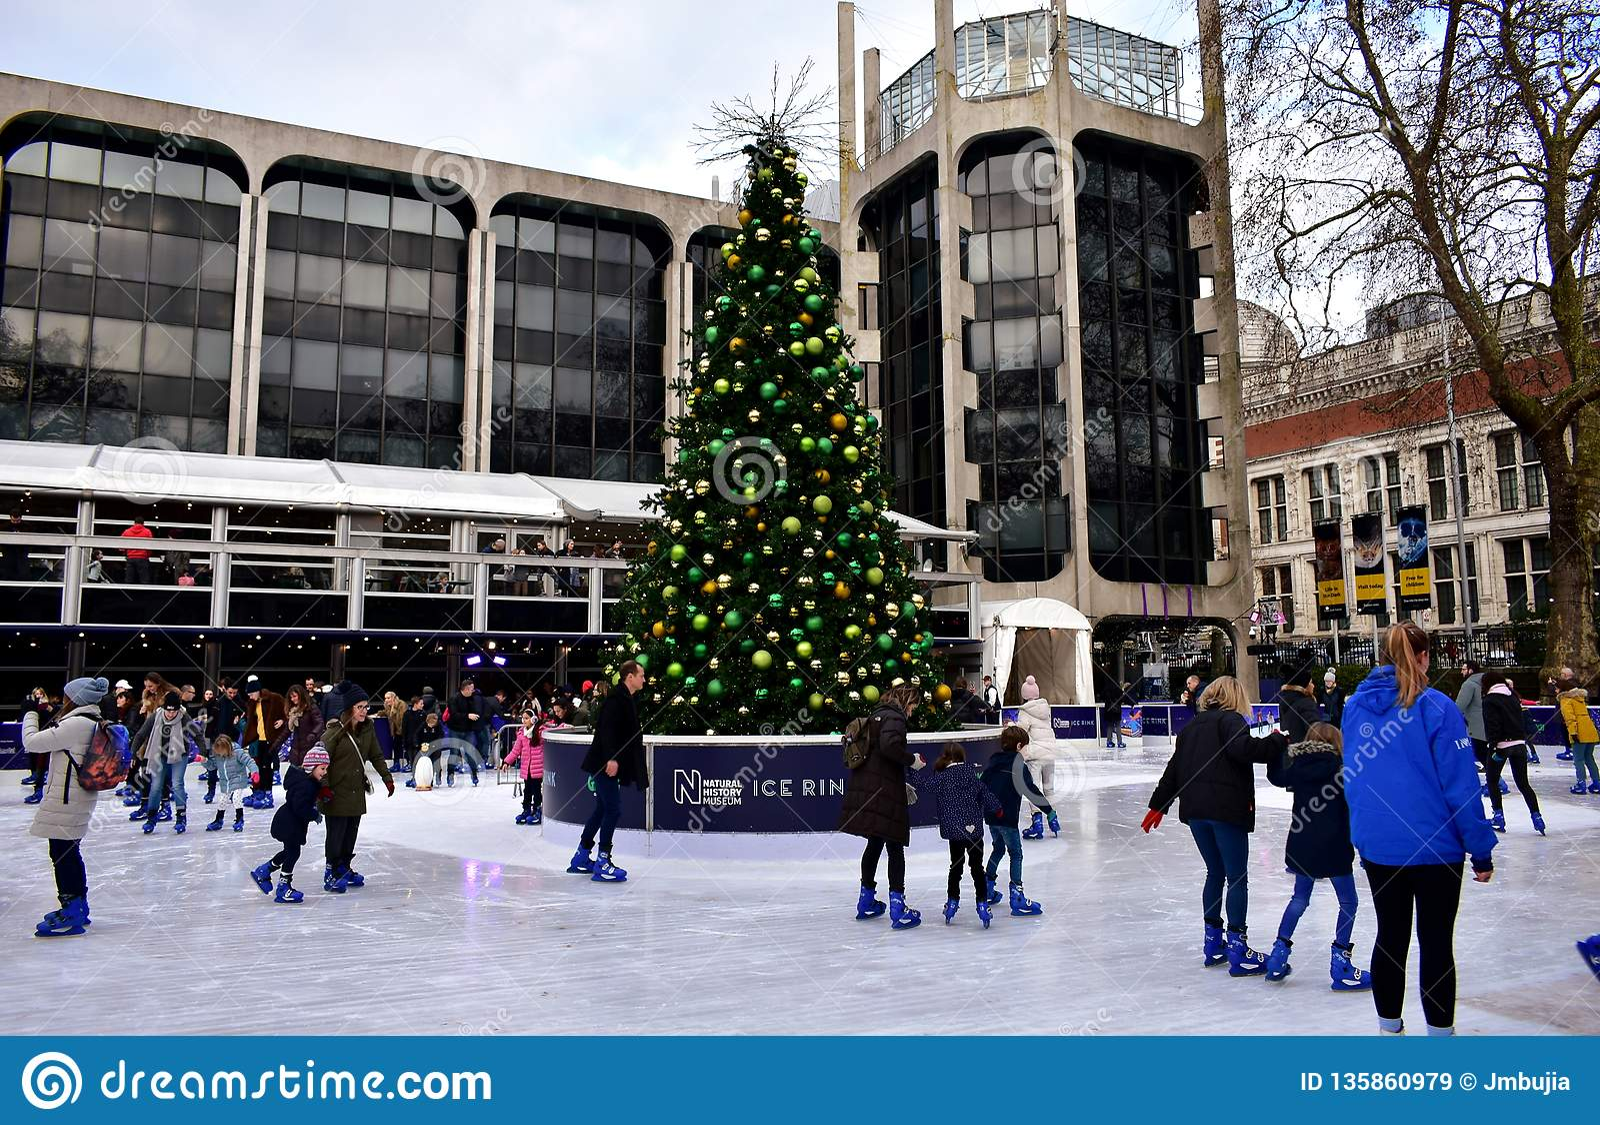 Christmas Ice Skating.People Skating On Ice At The Natural History Museum